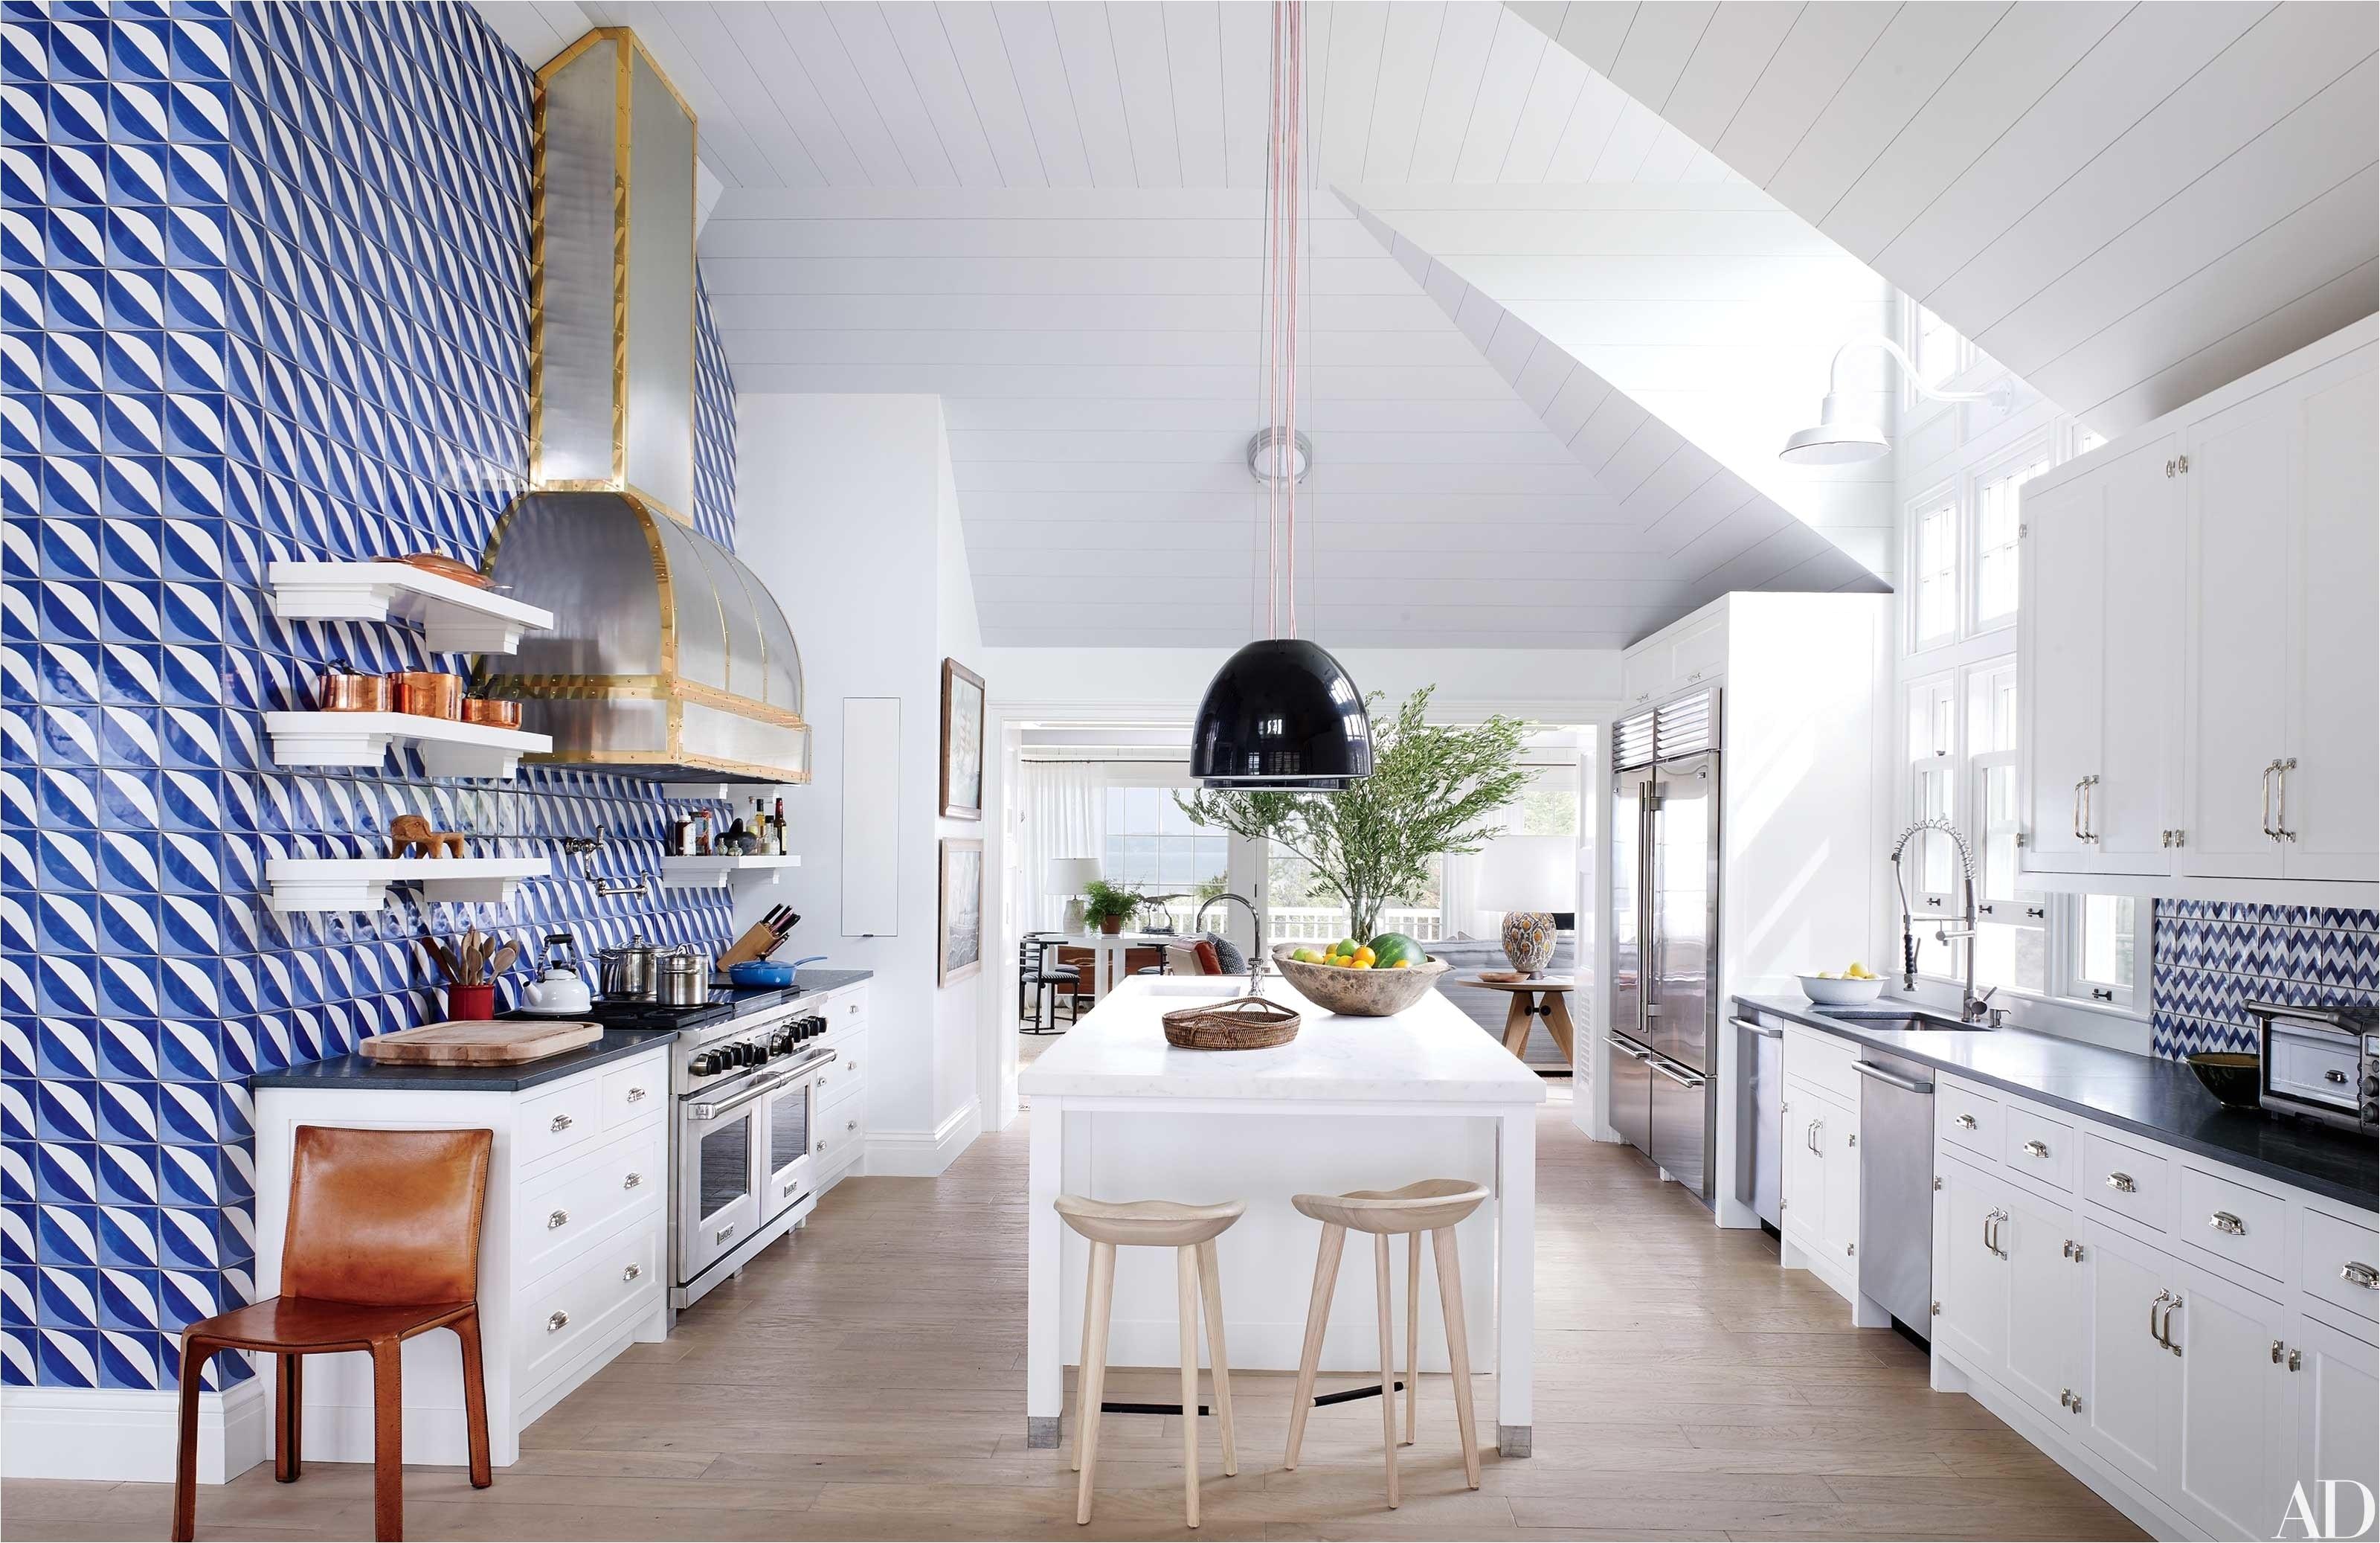 Custom Home Interior Design Inspirationa Kitchen Lighting Design Ideas Kitchen Decor Items New Zeev 0d